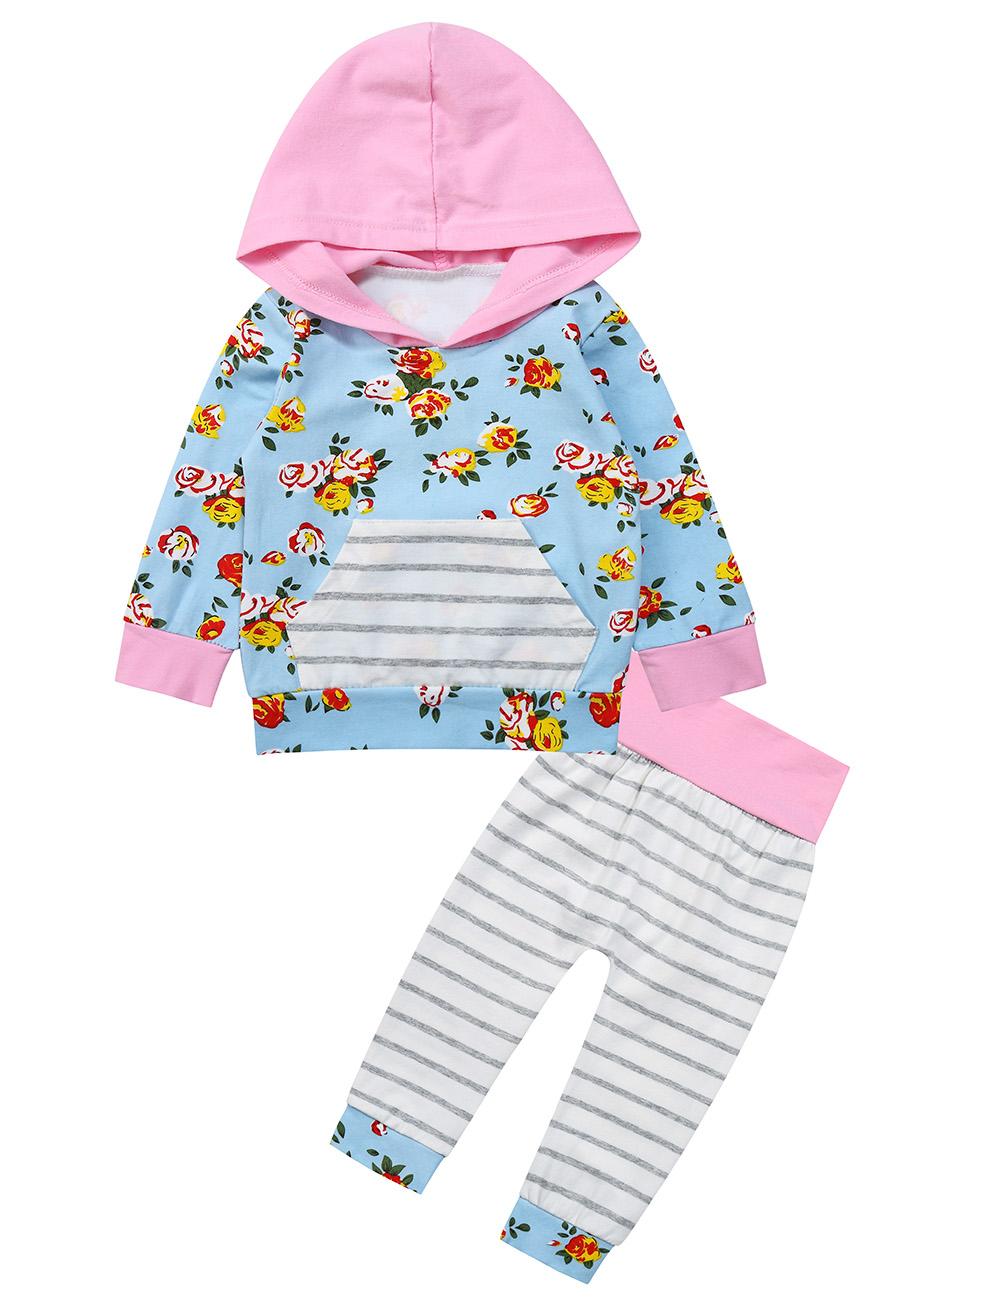 Kidlove Baby Girls' Flowers Hooded T-shirt Cotton Stripe Tops&Pants Pink